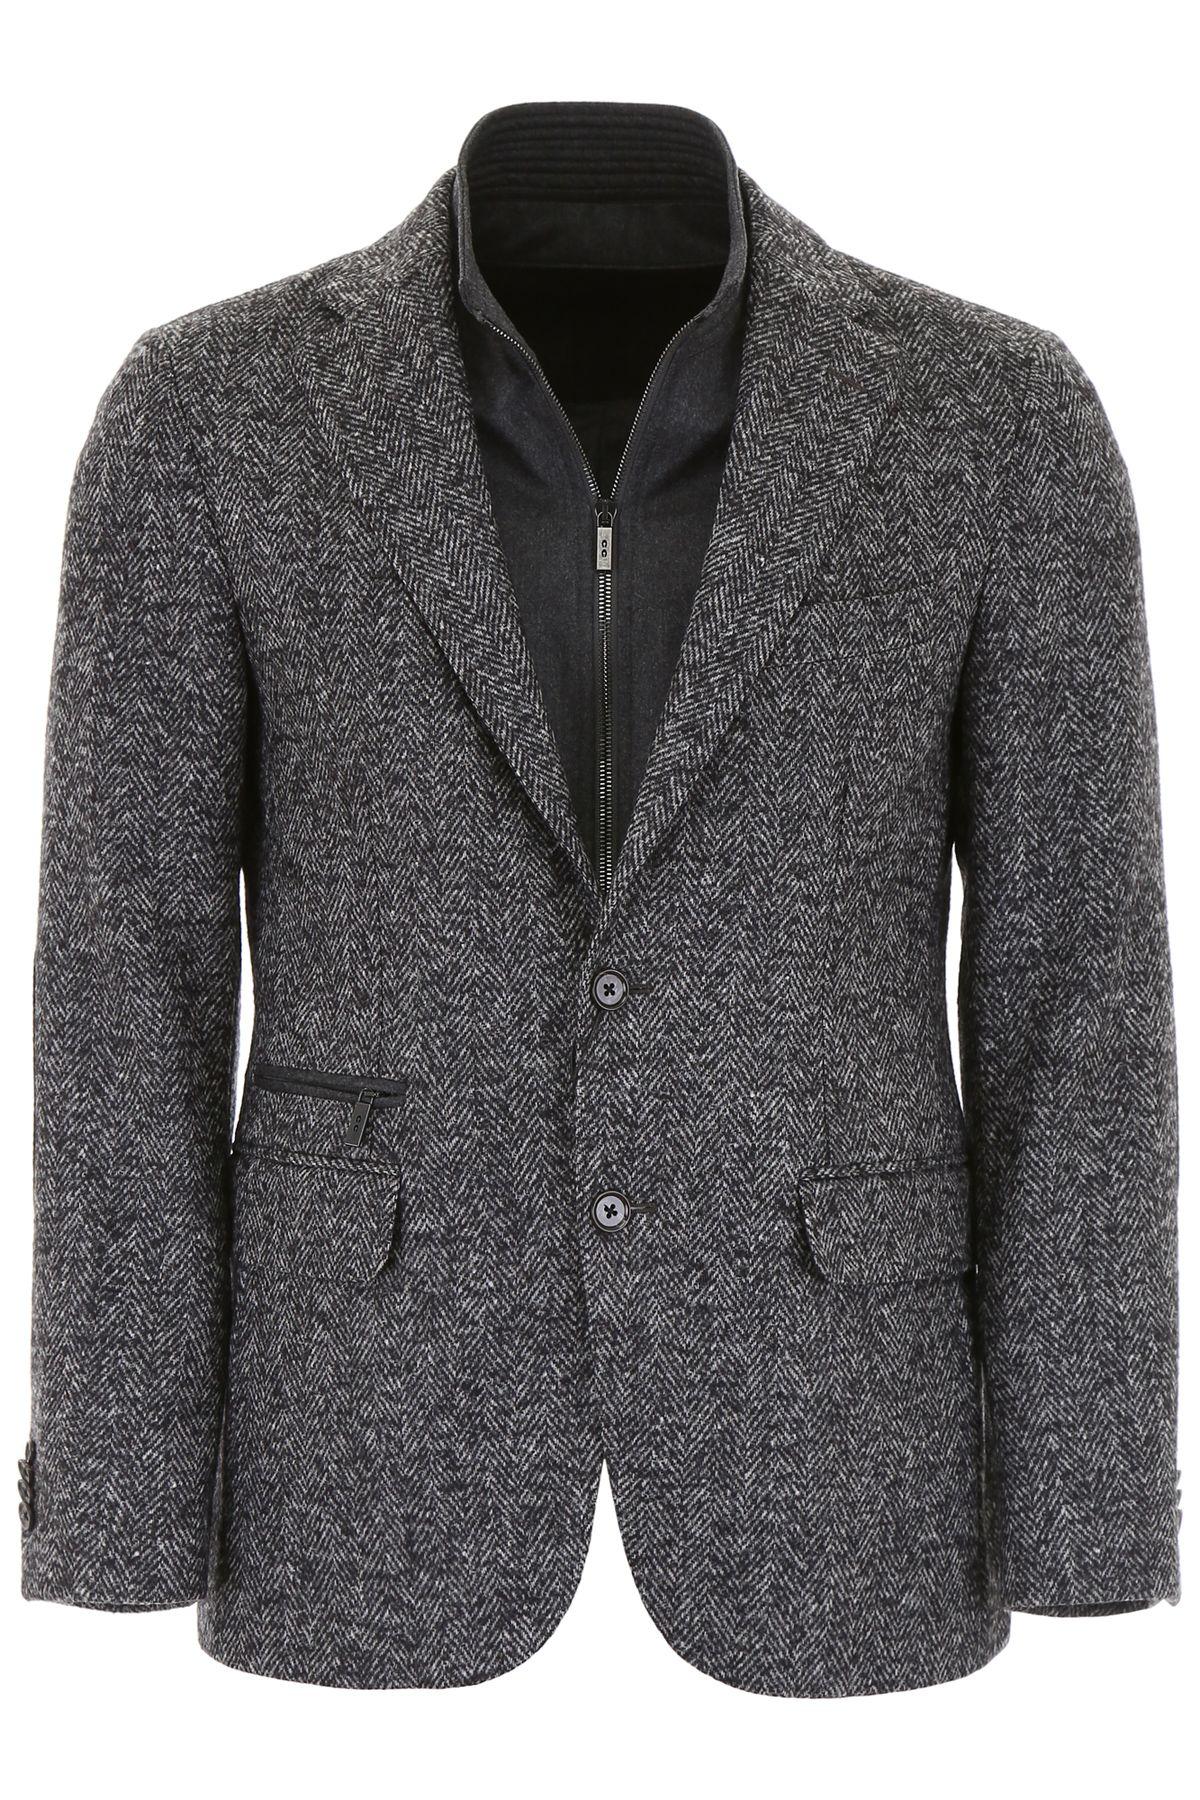 CC COLLECTION CORNELIANI Herringbone Blazer With Plastron in Grey Black